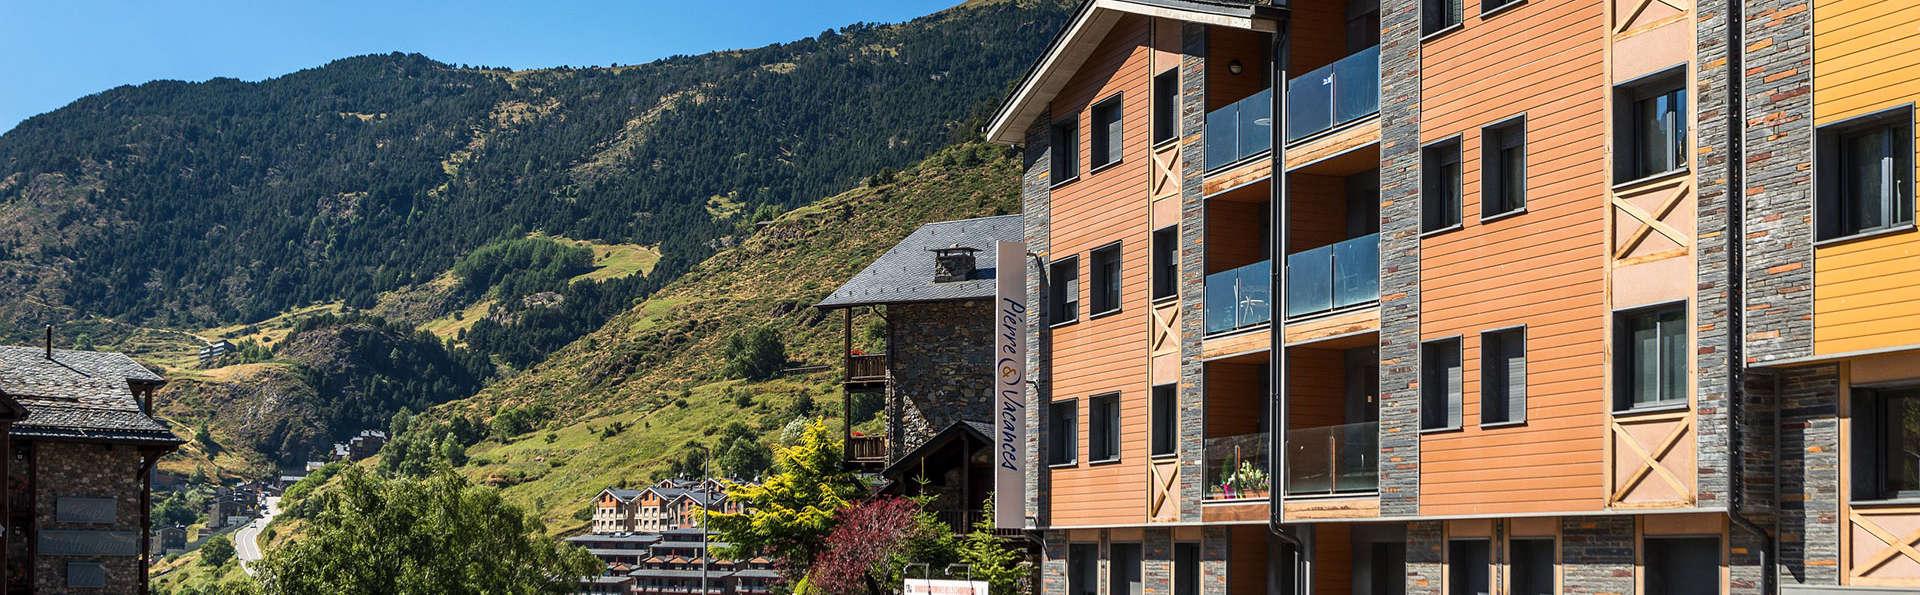 Pierre & Vacances Andorra El Tarter - Edit_Front3.jpg